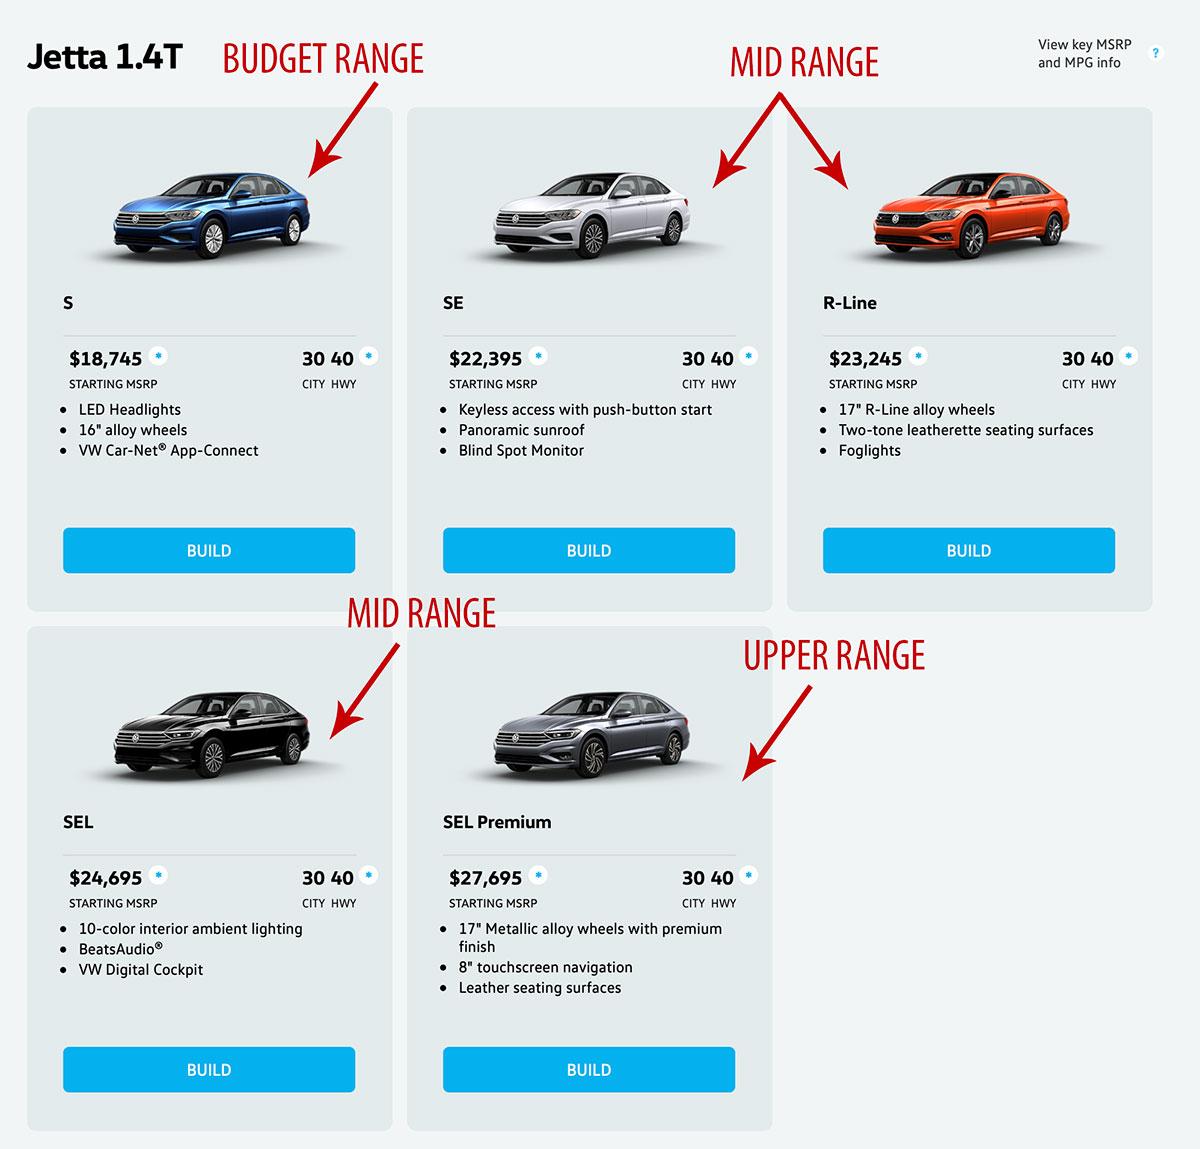 VW Jetta price ranges